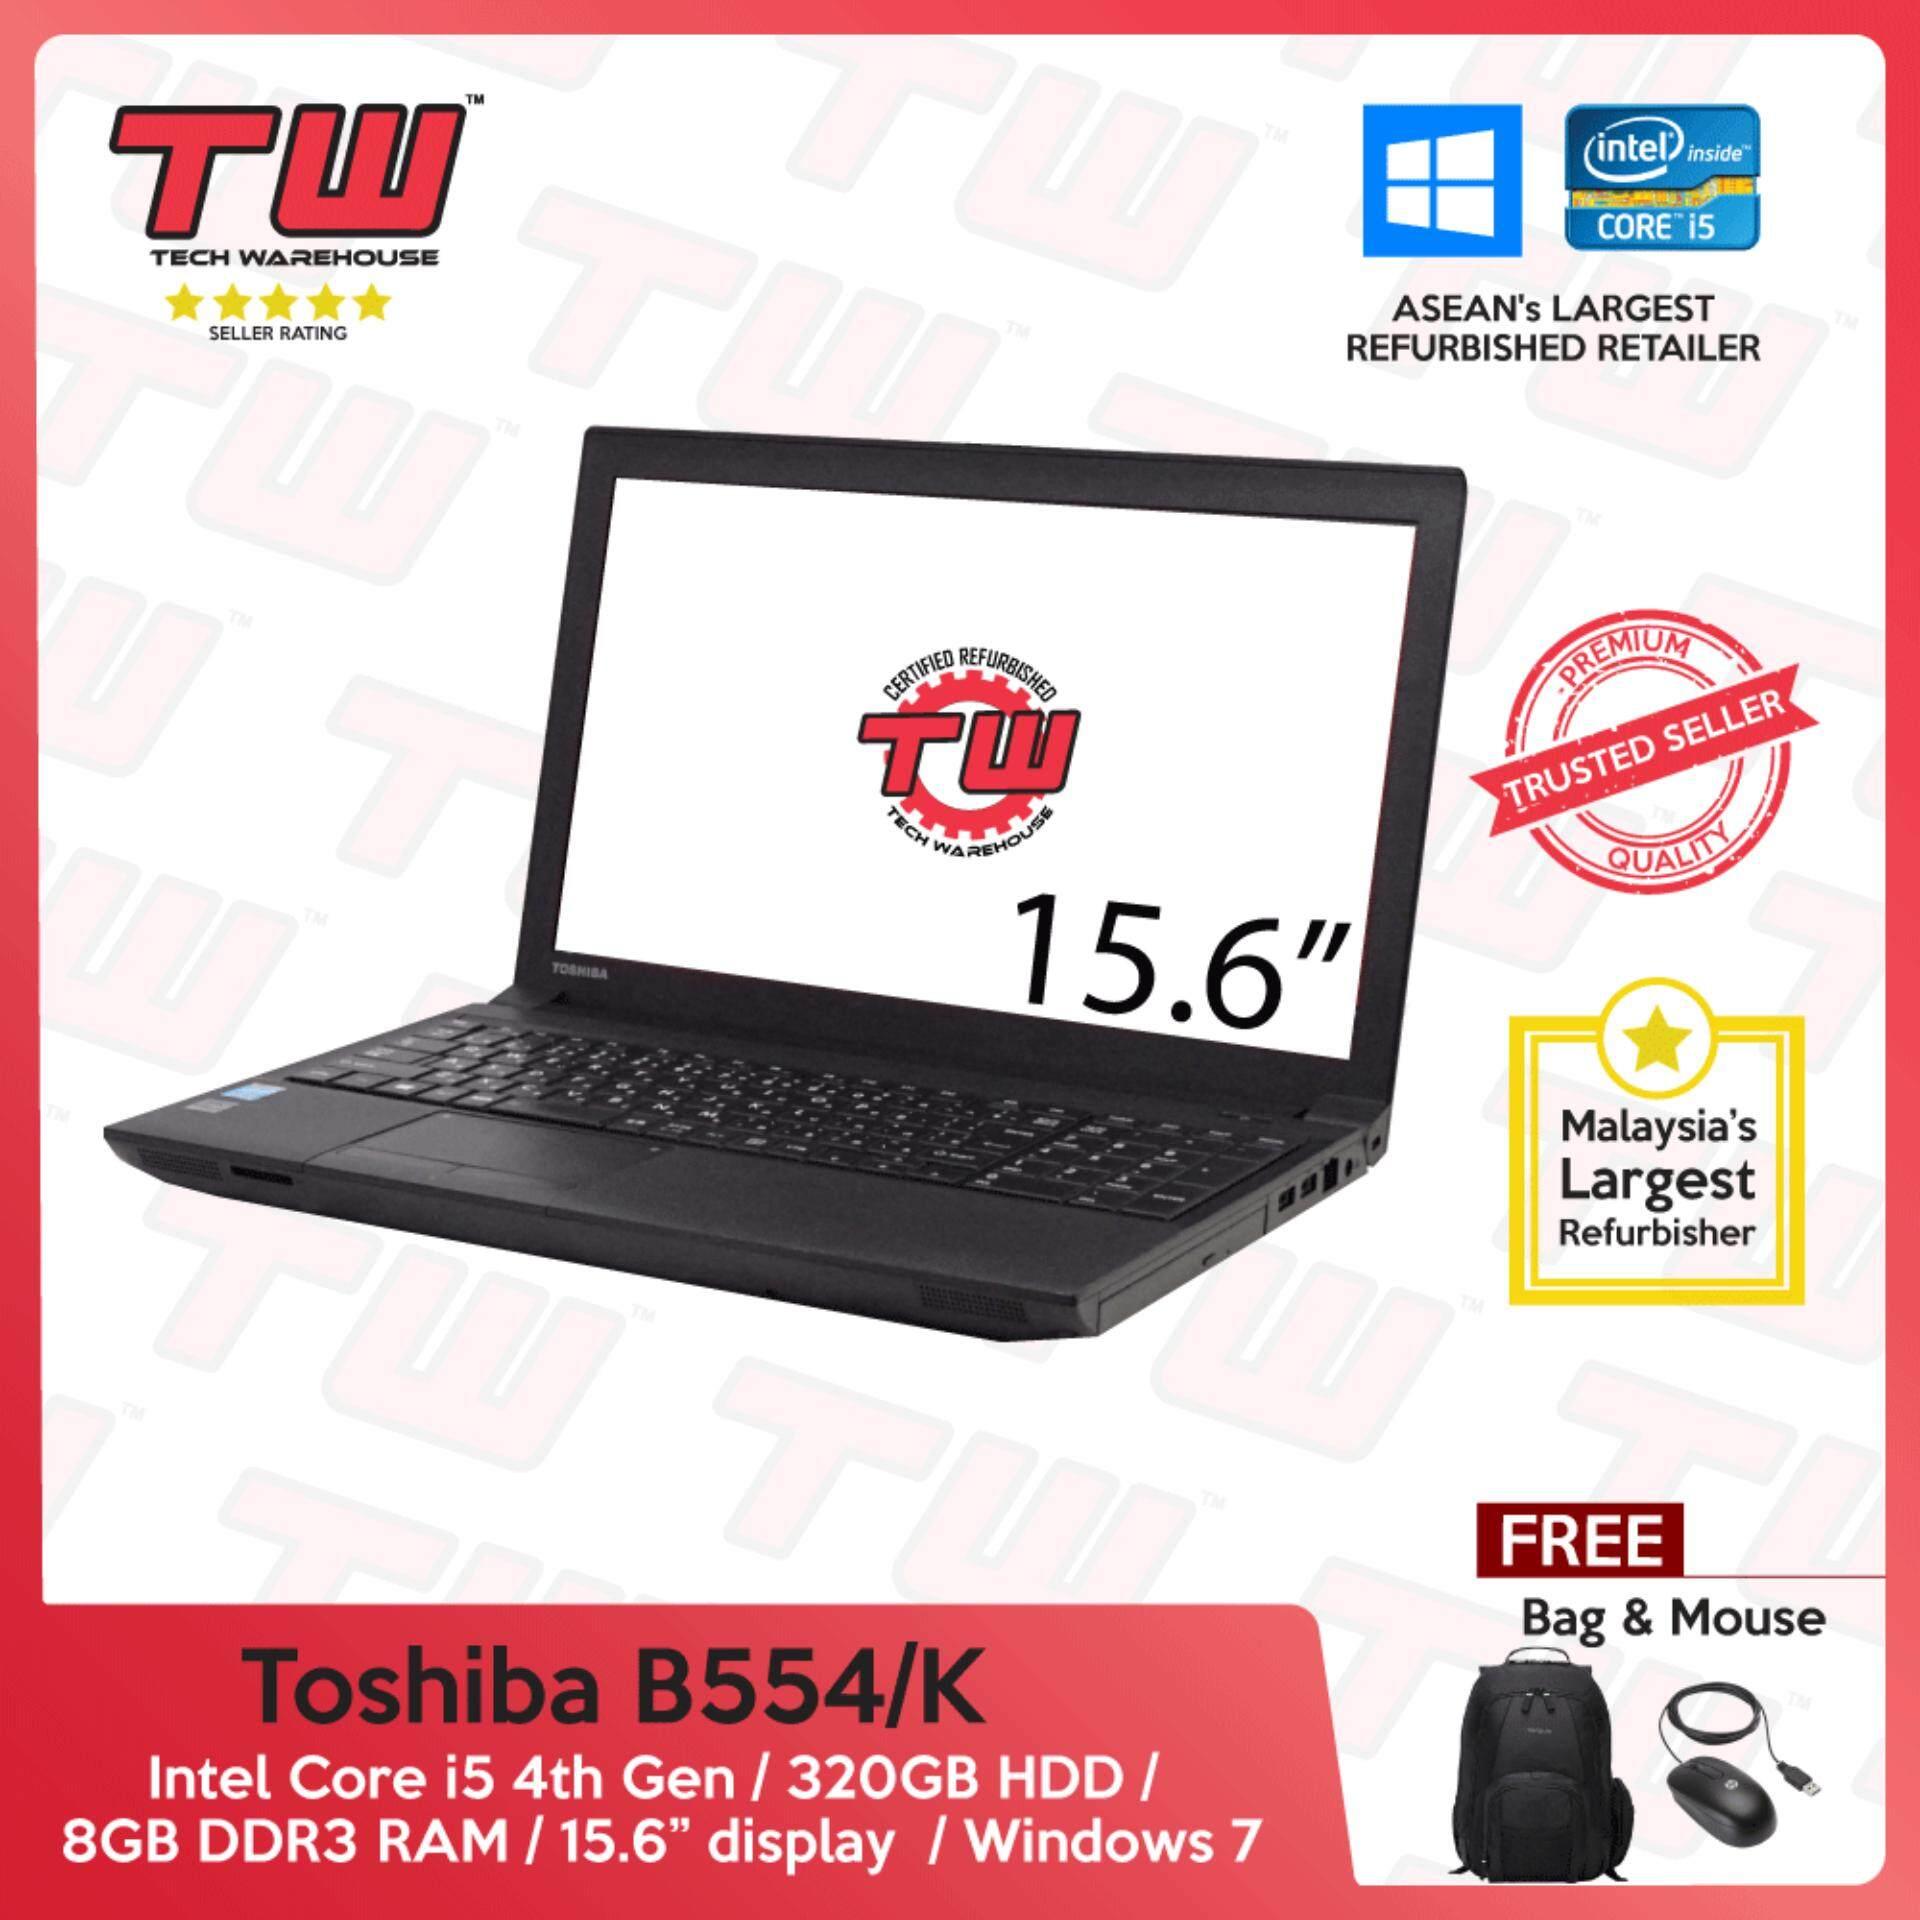 Toshiba Notebook B554/K Core i5 4th Gen 2.50GHz / 8GB RAM / 320GB HDD / Windows 7 Laptop / 3 Month Warranty (Factory Refurbished) Malaysia